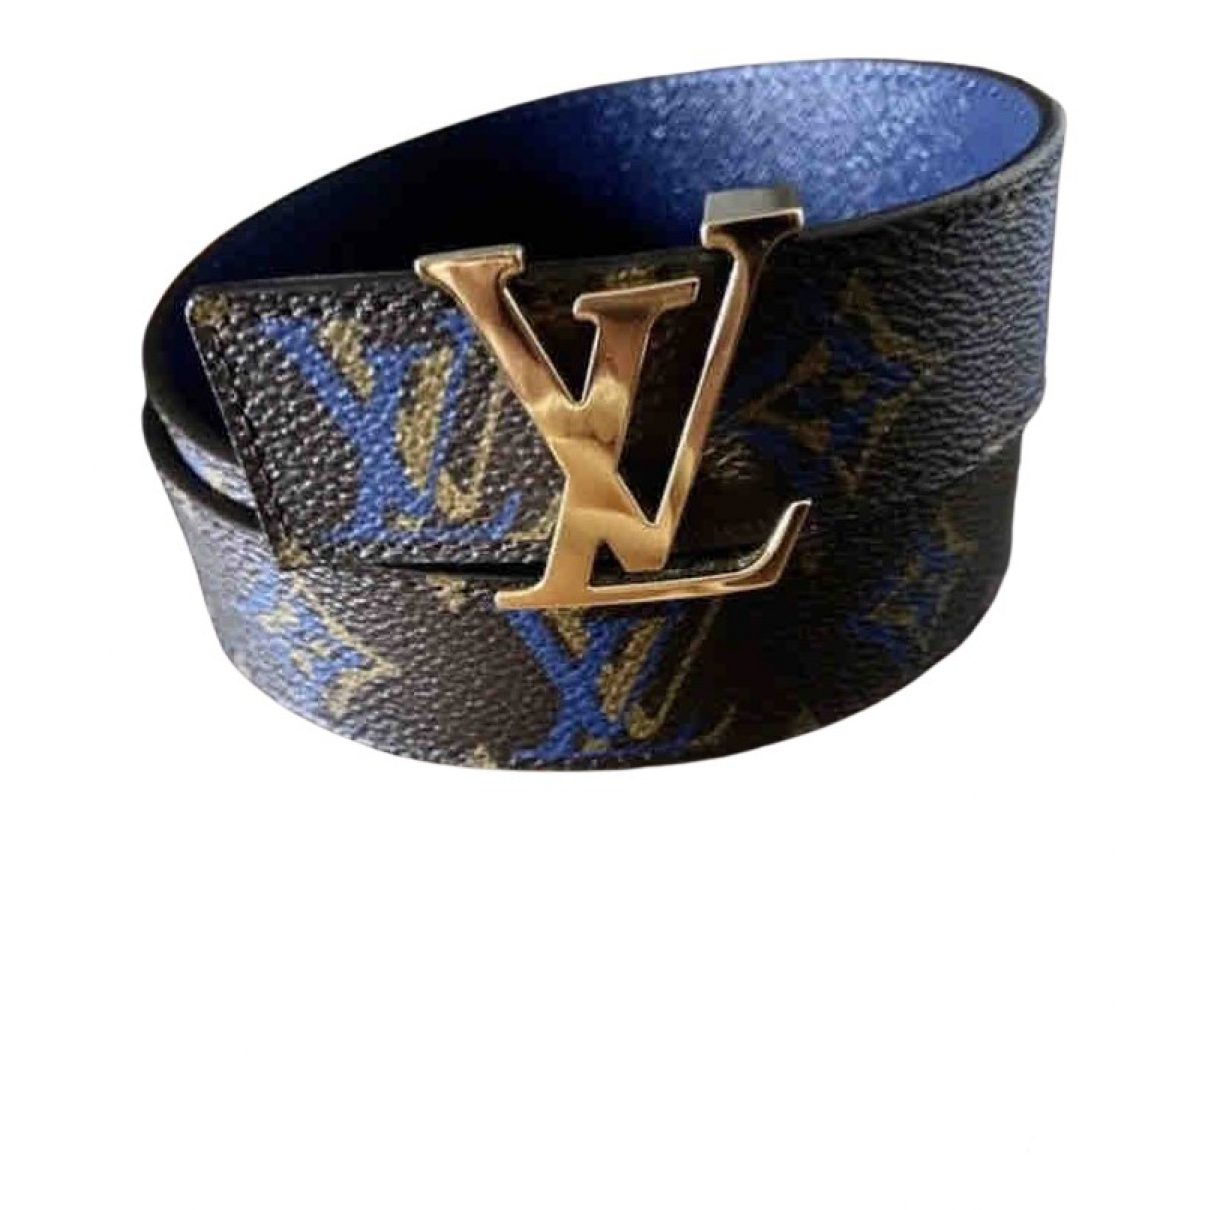 Cinturon Initiales de Lona Louis Vuitton